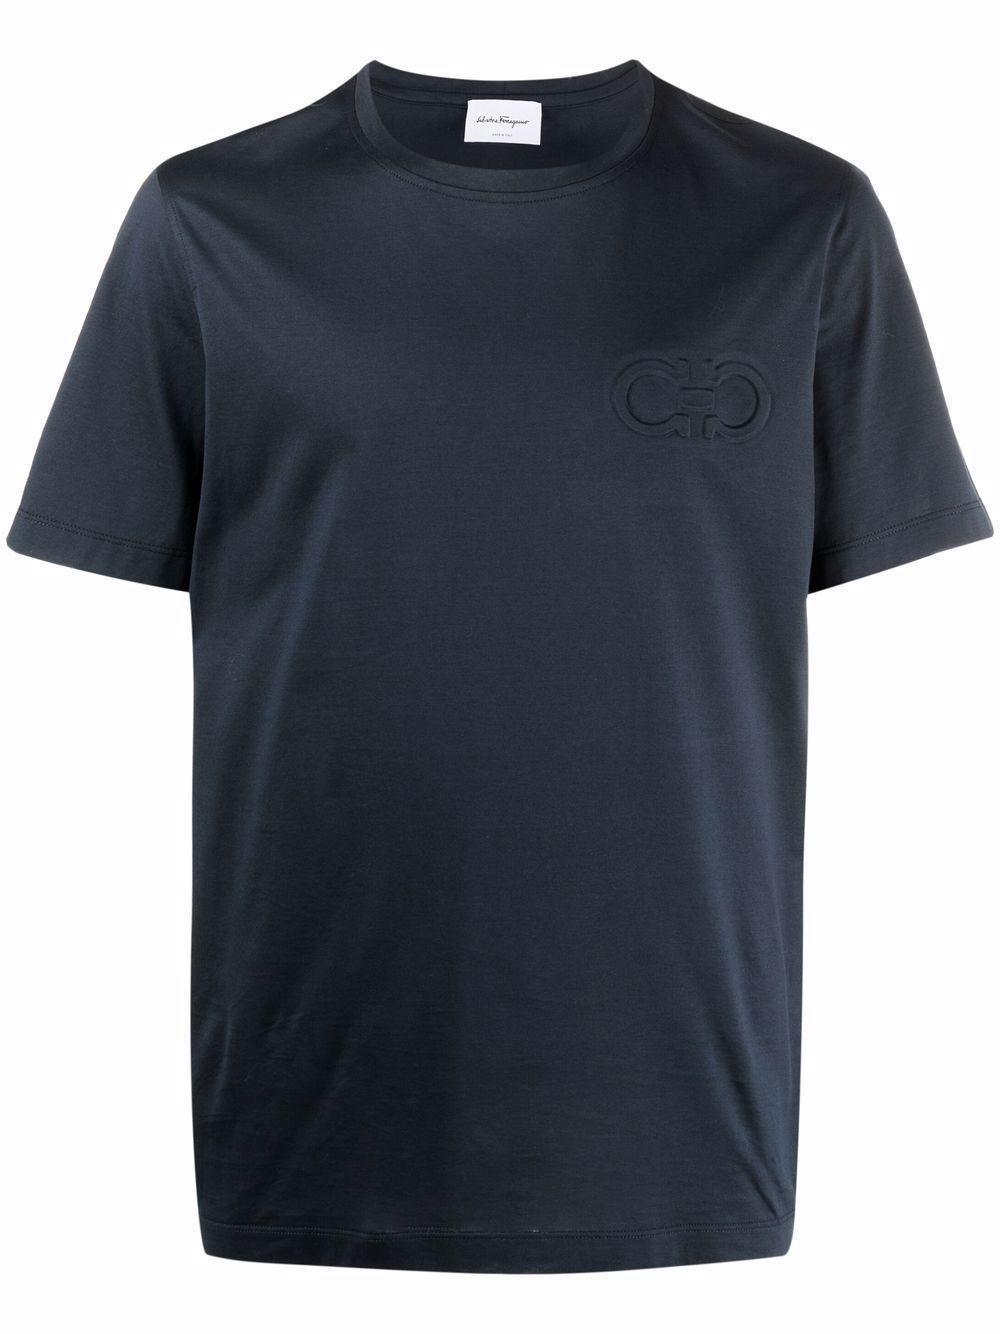 T-shirt gancio logo in cotone